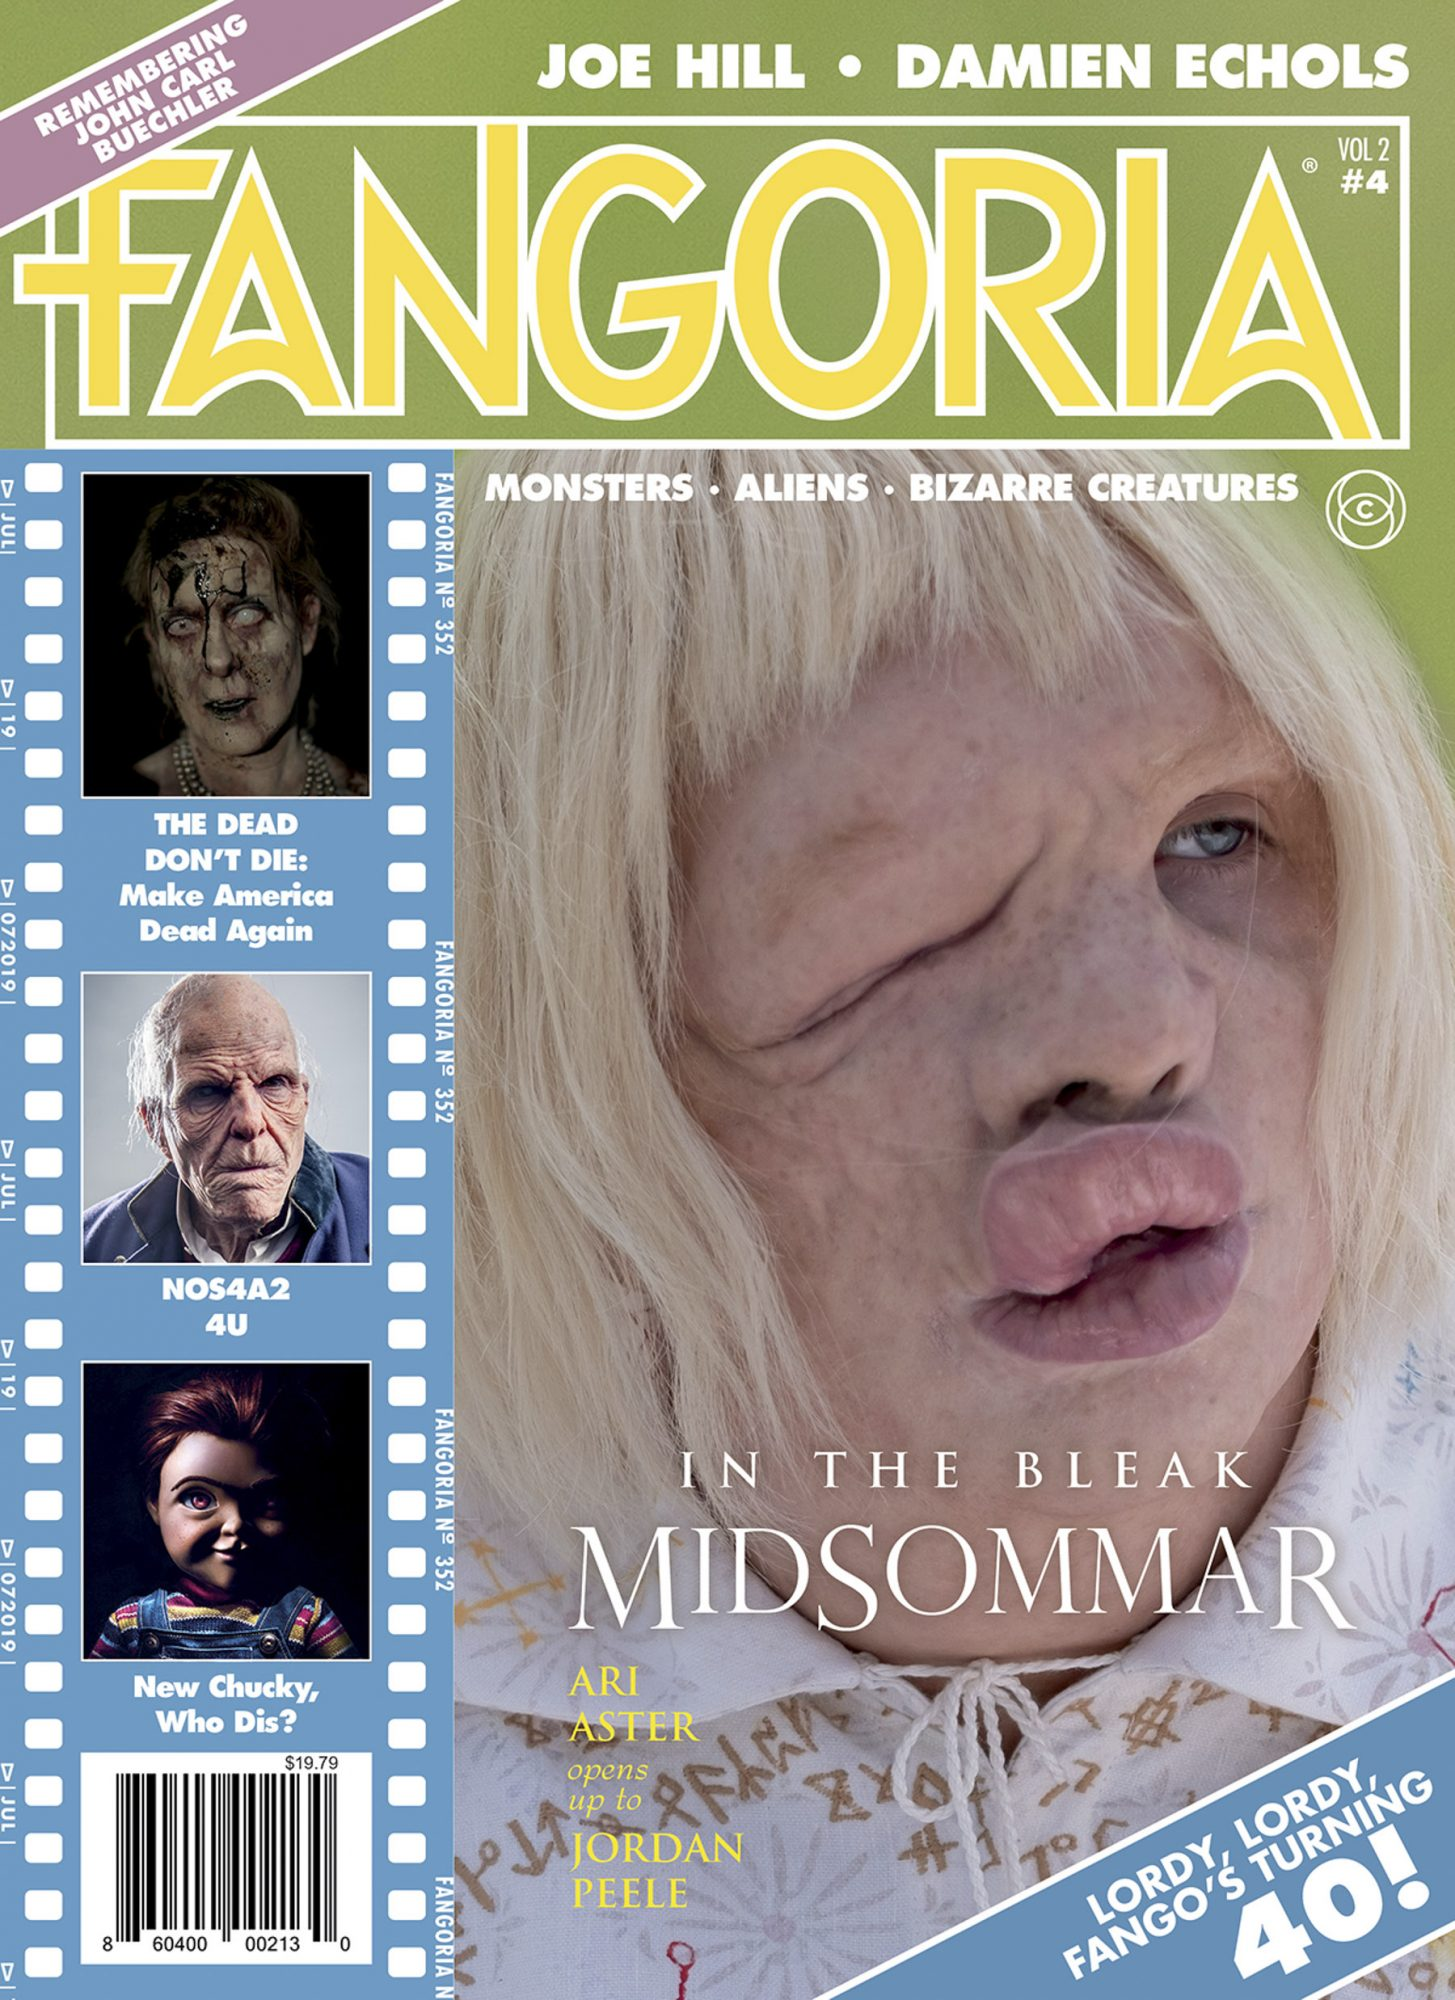 Fangoria July 2019 cover CR: Fangoria